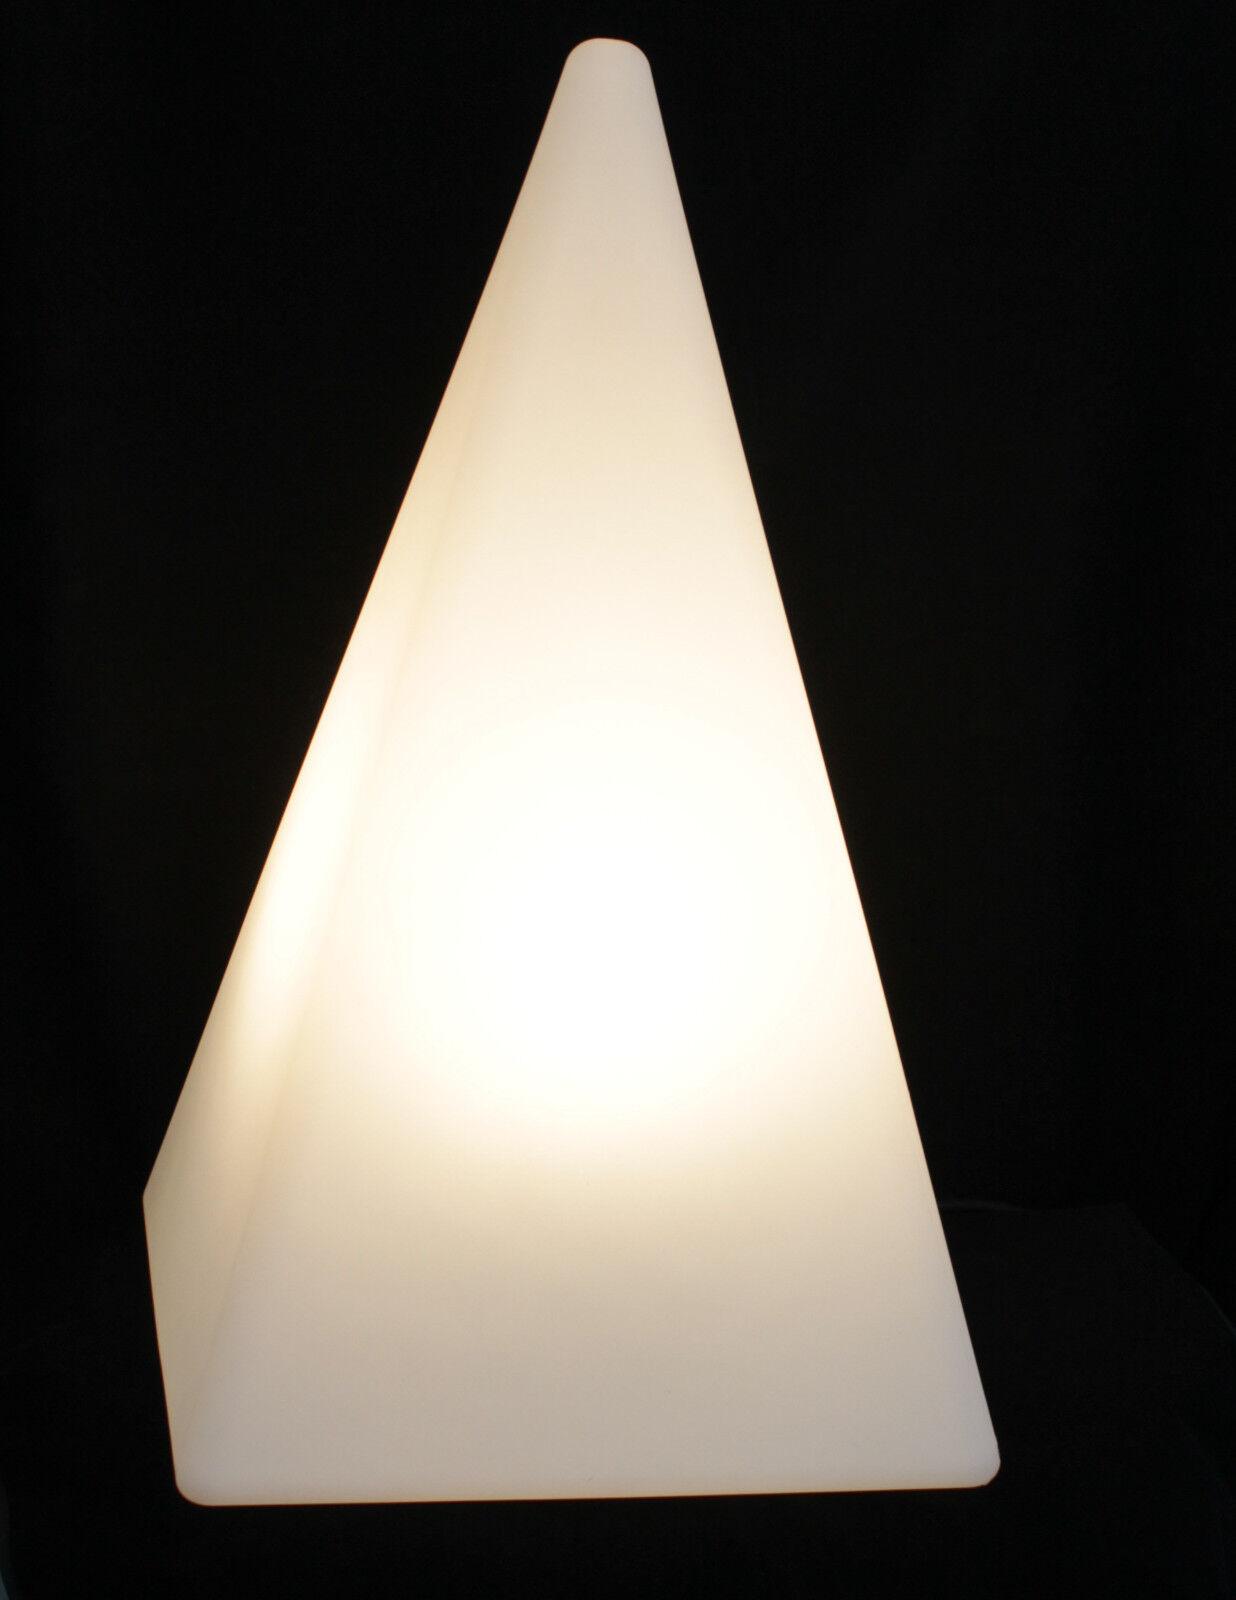 Figur Pyramide 630mm weiß inkl. 5m Kabel Leuchte Garten LED wahlweise TG7231-60